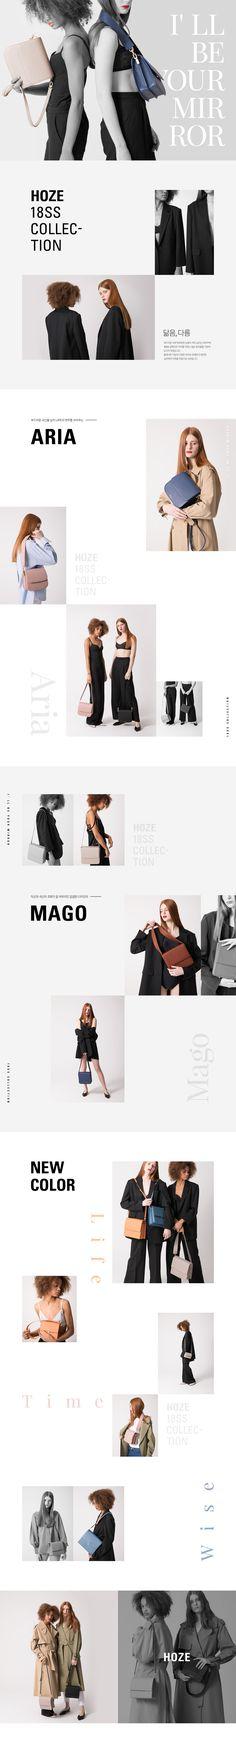 Web Layout, Layout Design, Website Layout, Fashion Web Design, Lookbook Design, Fashion Banner, Newspaper Design, Branding, Newsletter Design